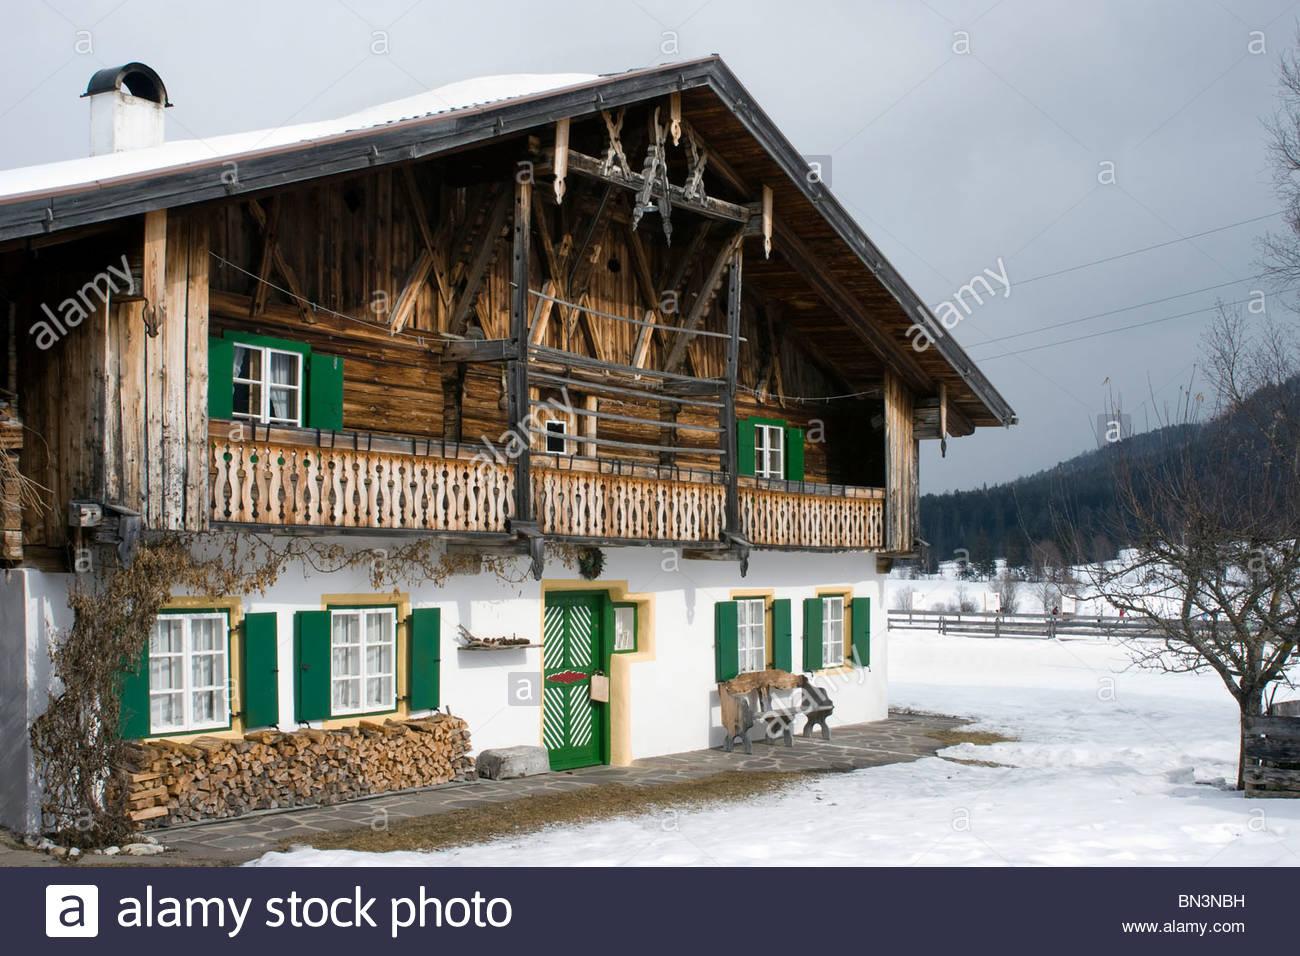 Historica farmhouse in Moos, Leutasch, Tyrol, Austria - Stock Image